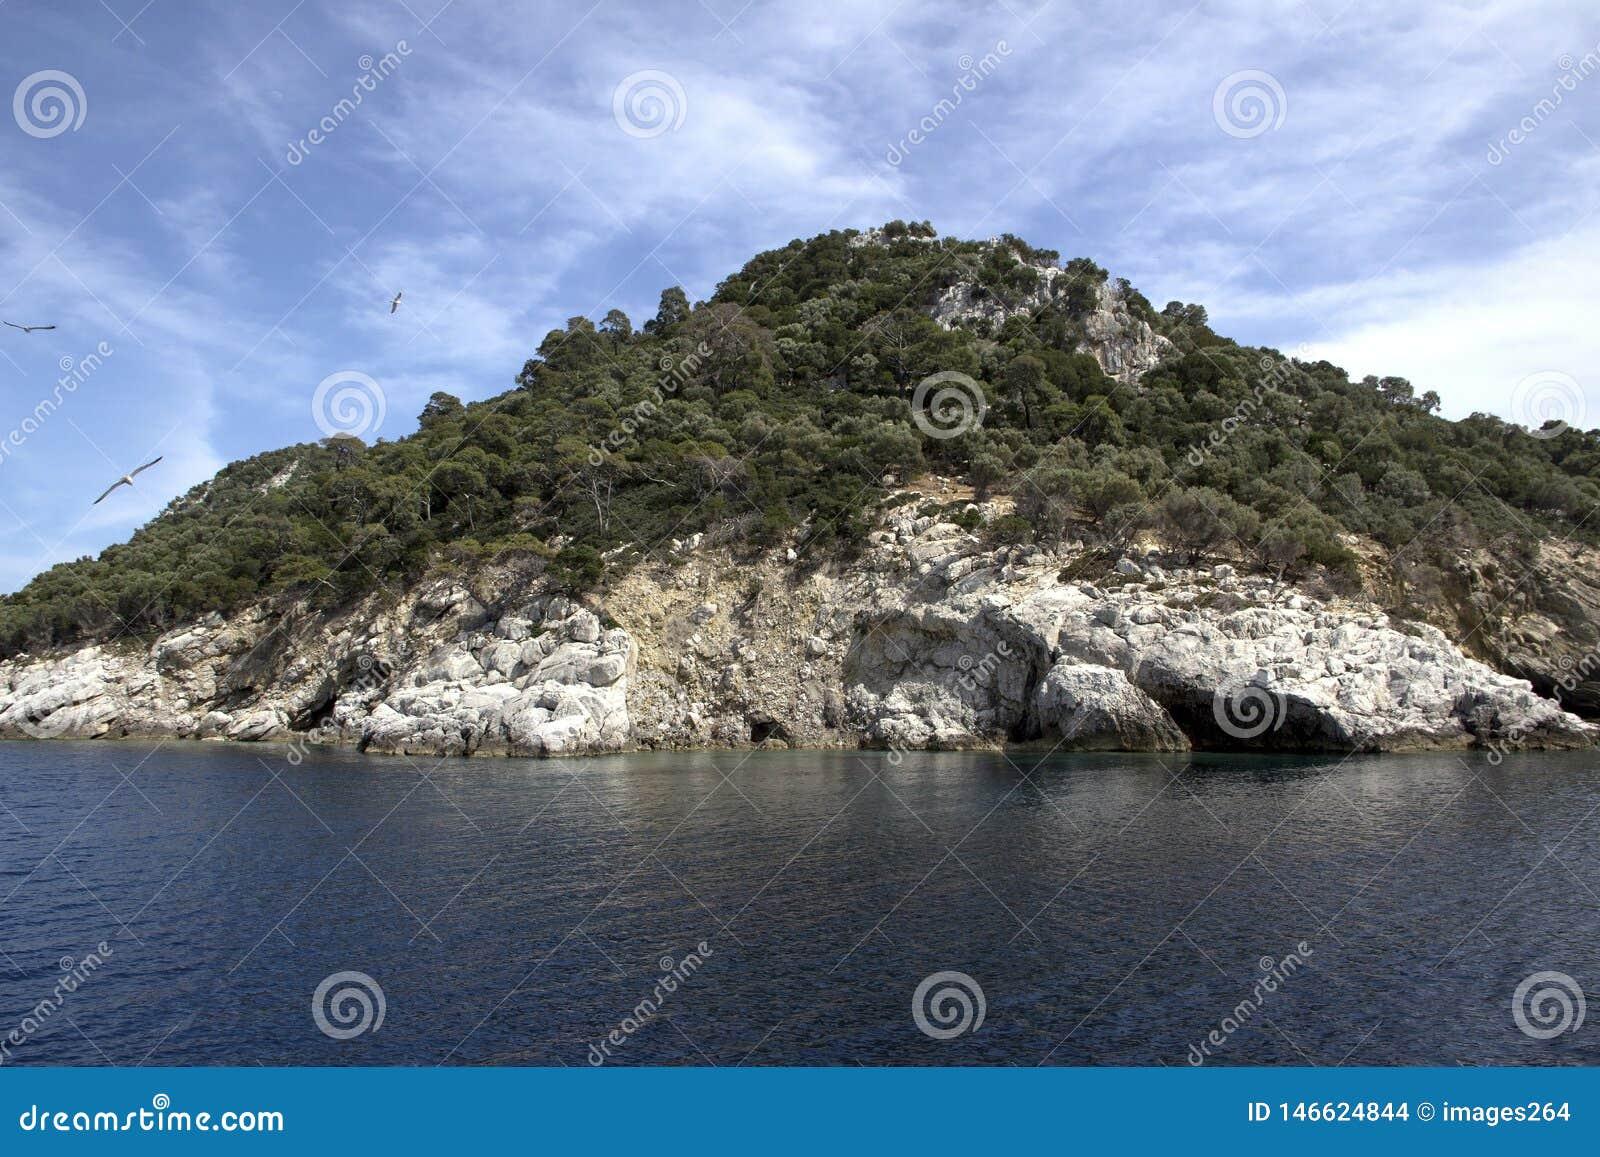 Turtle island in Greece